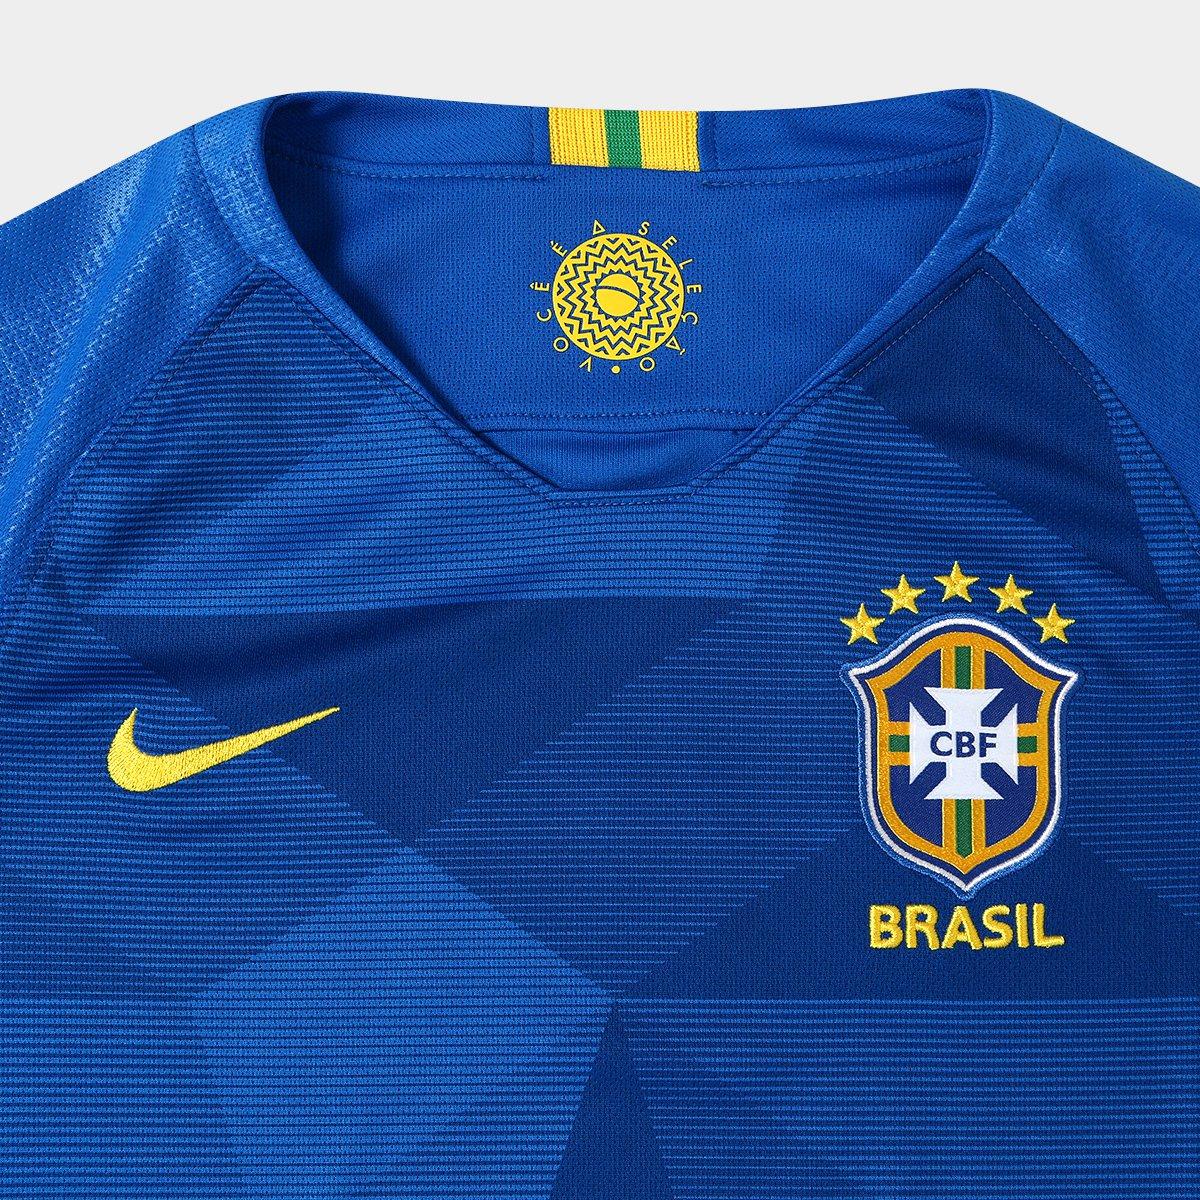 Camisa Seleção Brasil Juvenil II 2018 s n° - Torcedor Nike - Compre ... 3c6ee2634a806